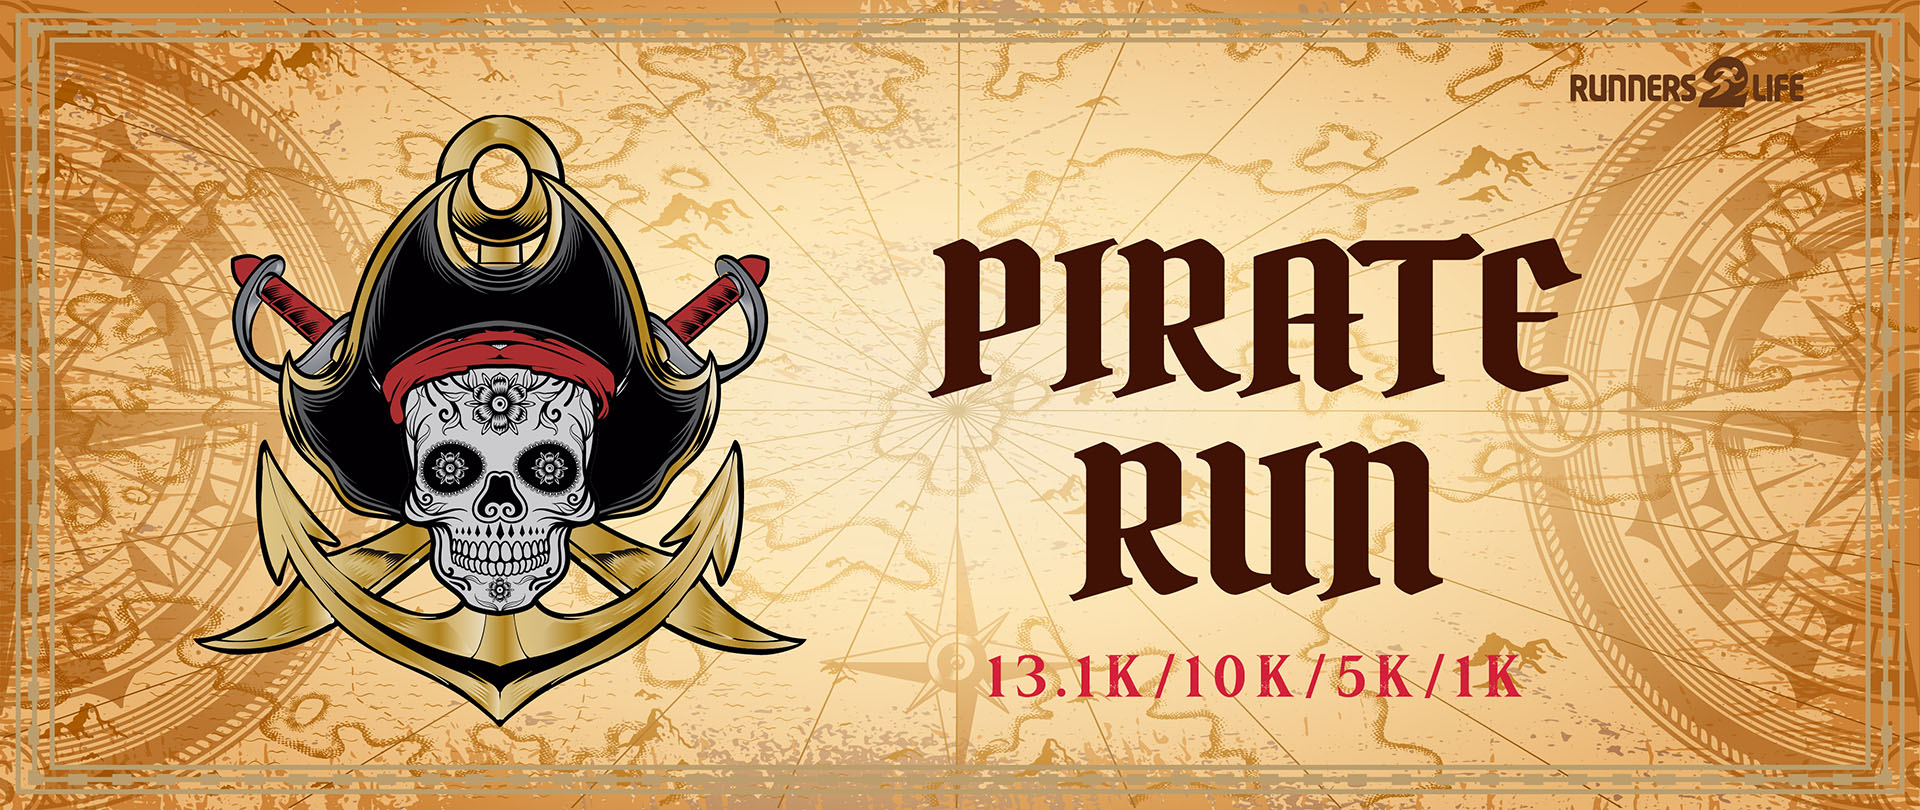 Day of Dead (Pirate Run)